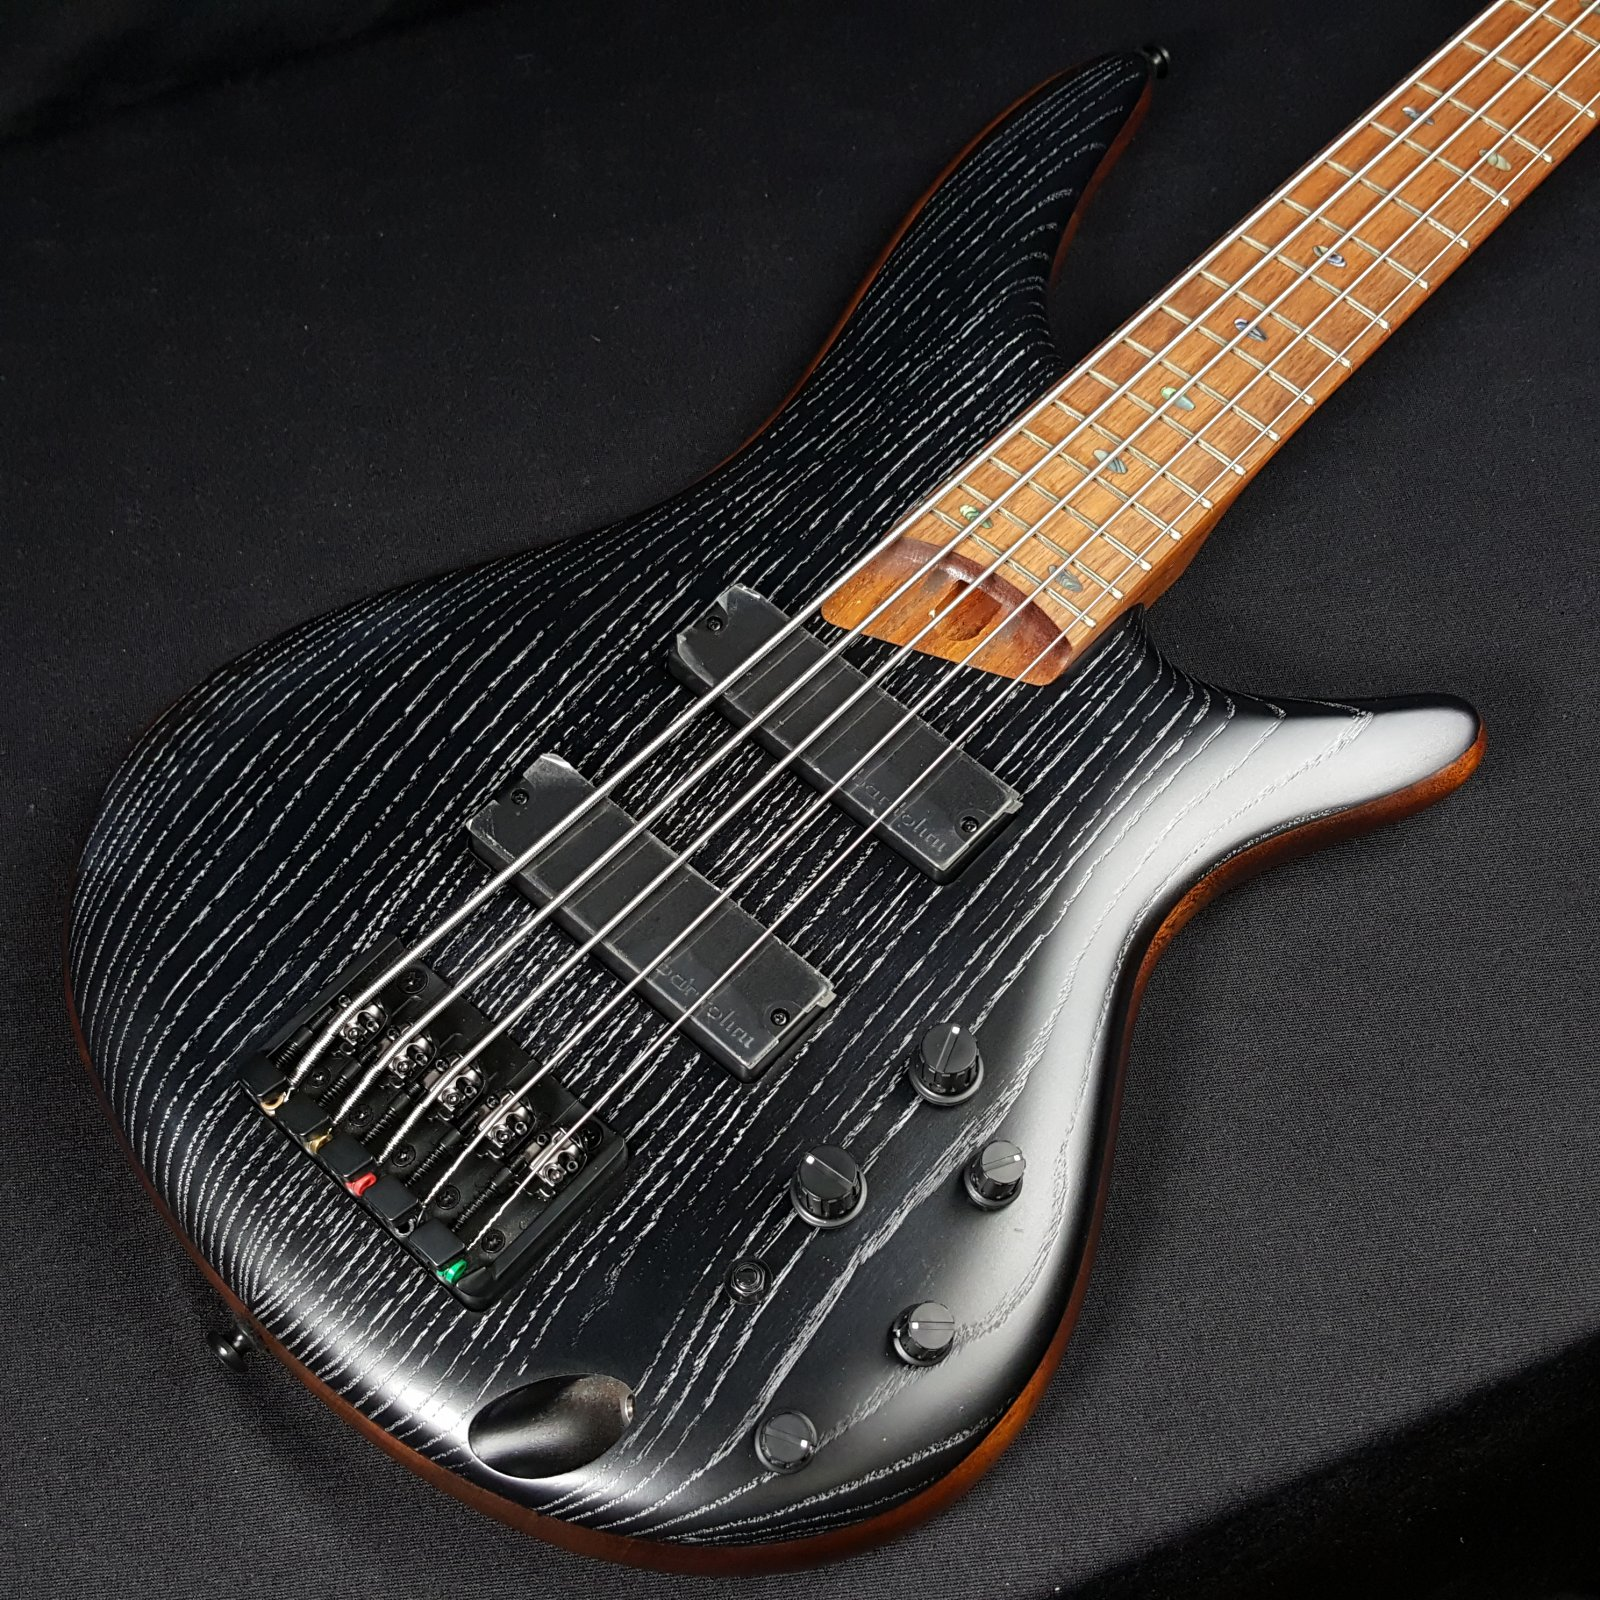 Ibanez SR675 5 String Electric Bass-Silver Wave Flat Black